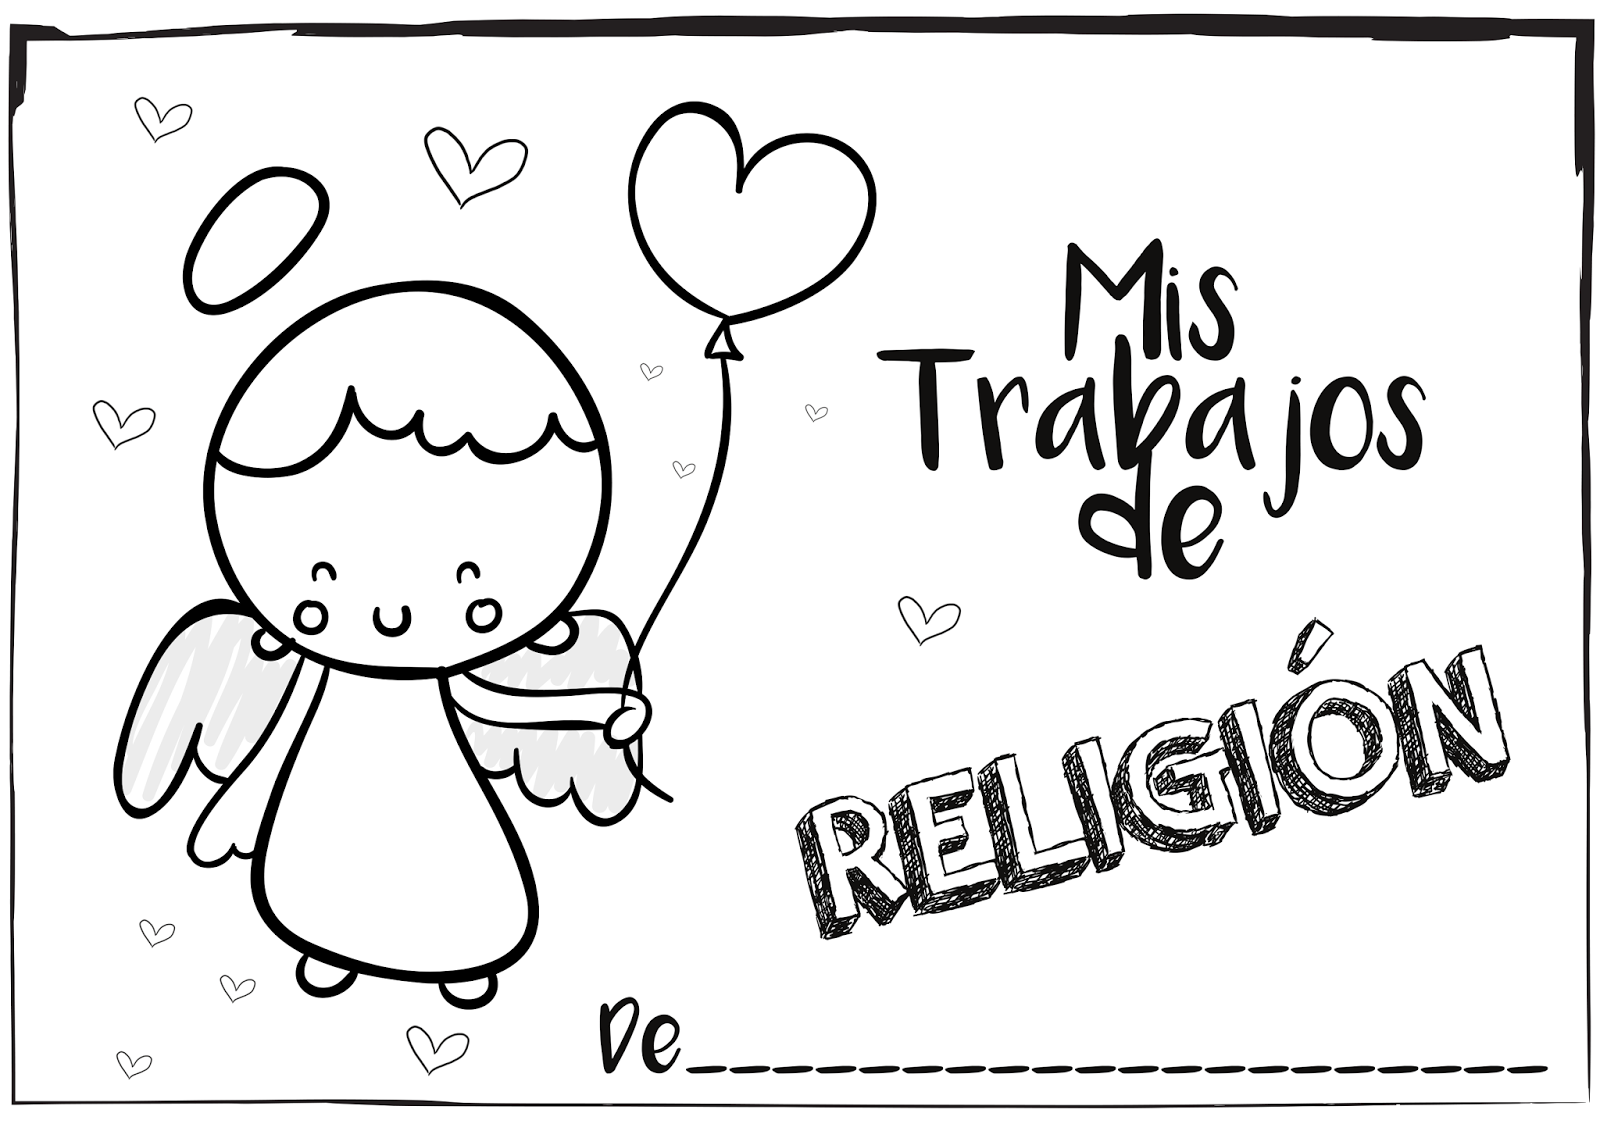 Dibujos Clase De Religion: Si Quieres Aprender, ENSEÑA.: Portadas